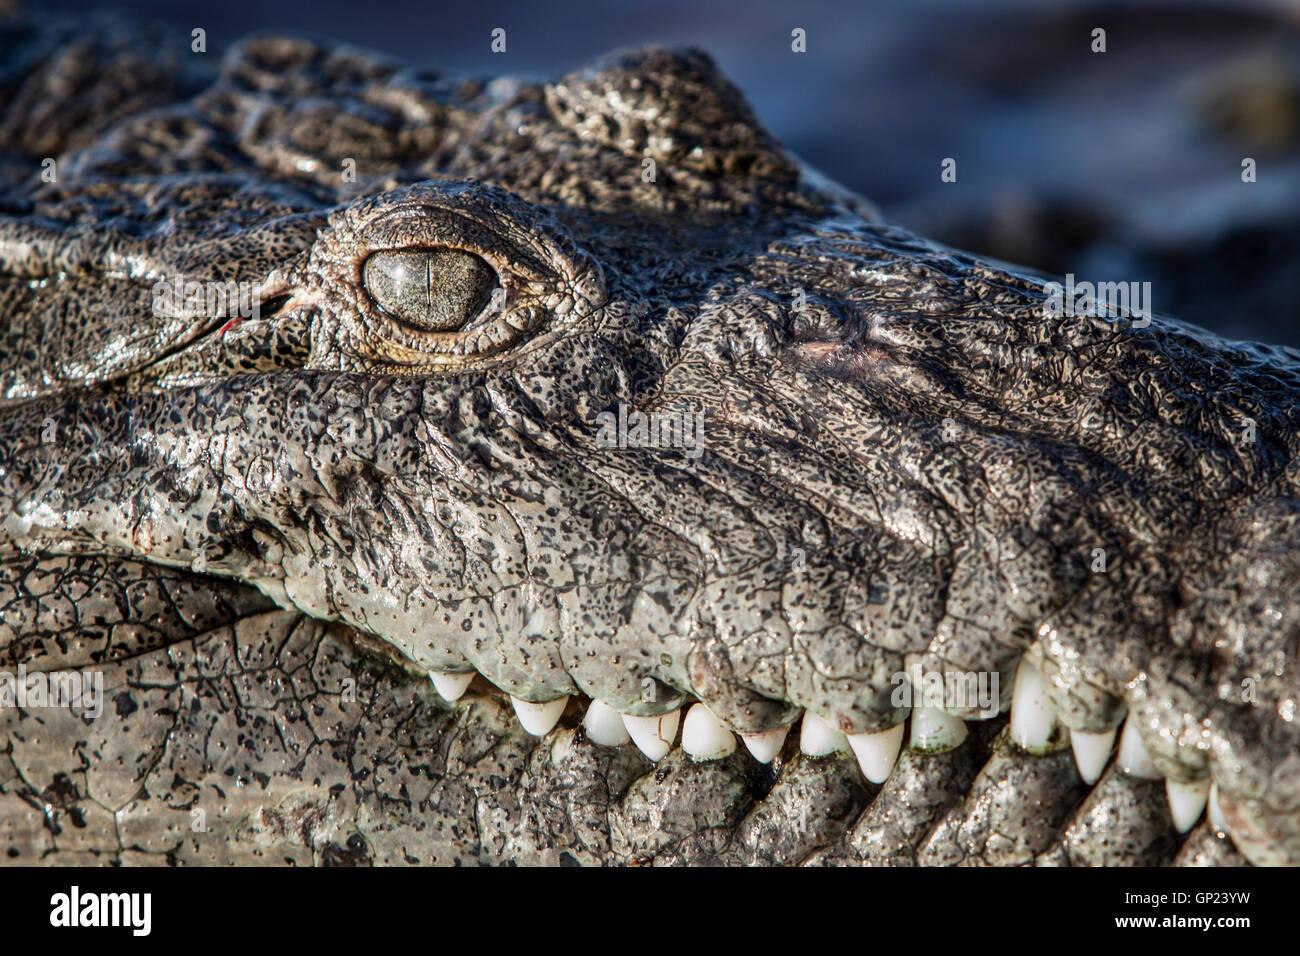 Head of American Crocodile, Crocodylus acutus, Turneffe Atoll, Caribbean, Belize - Stock Image